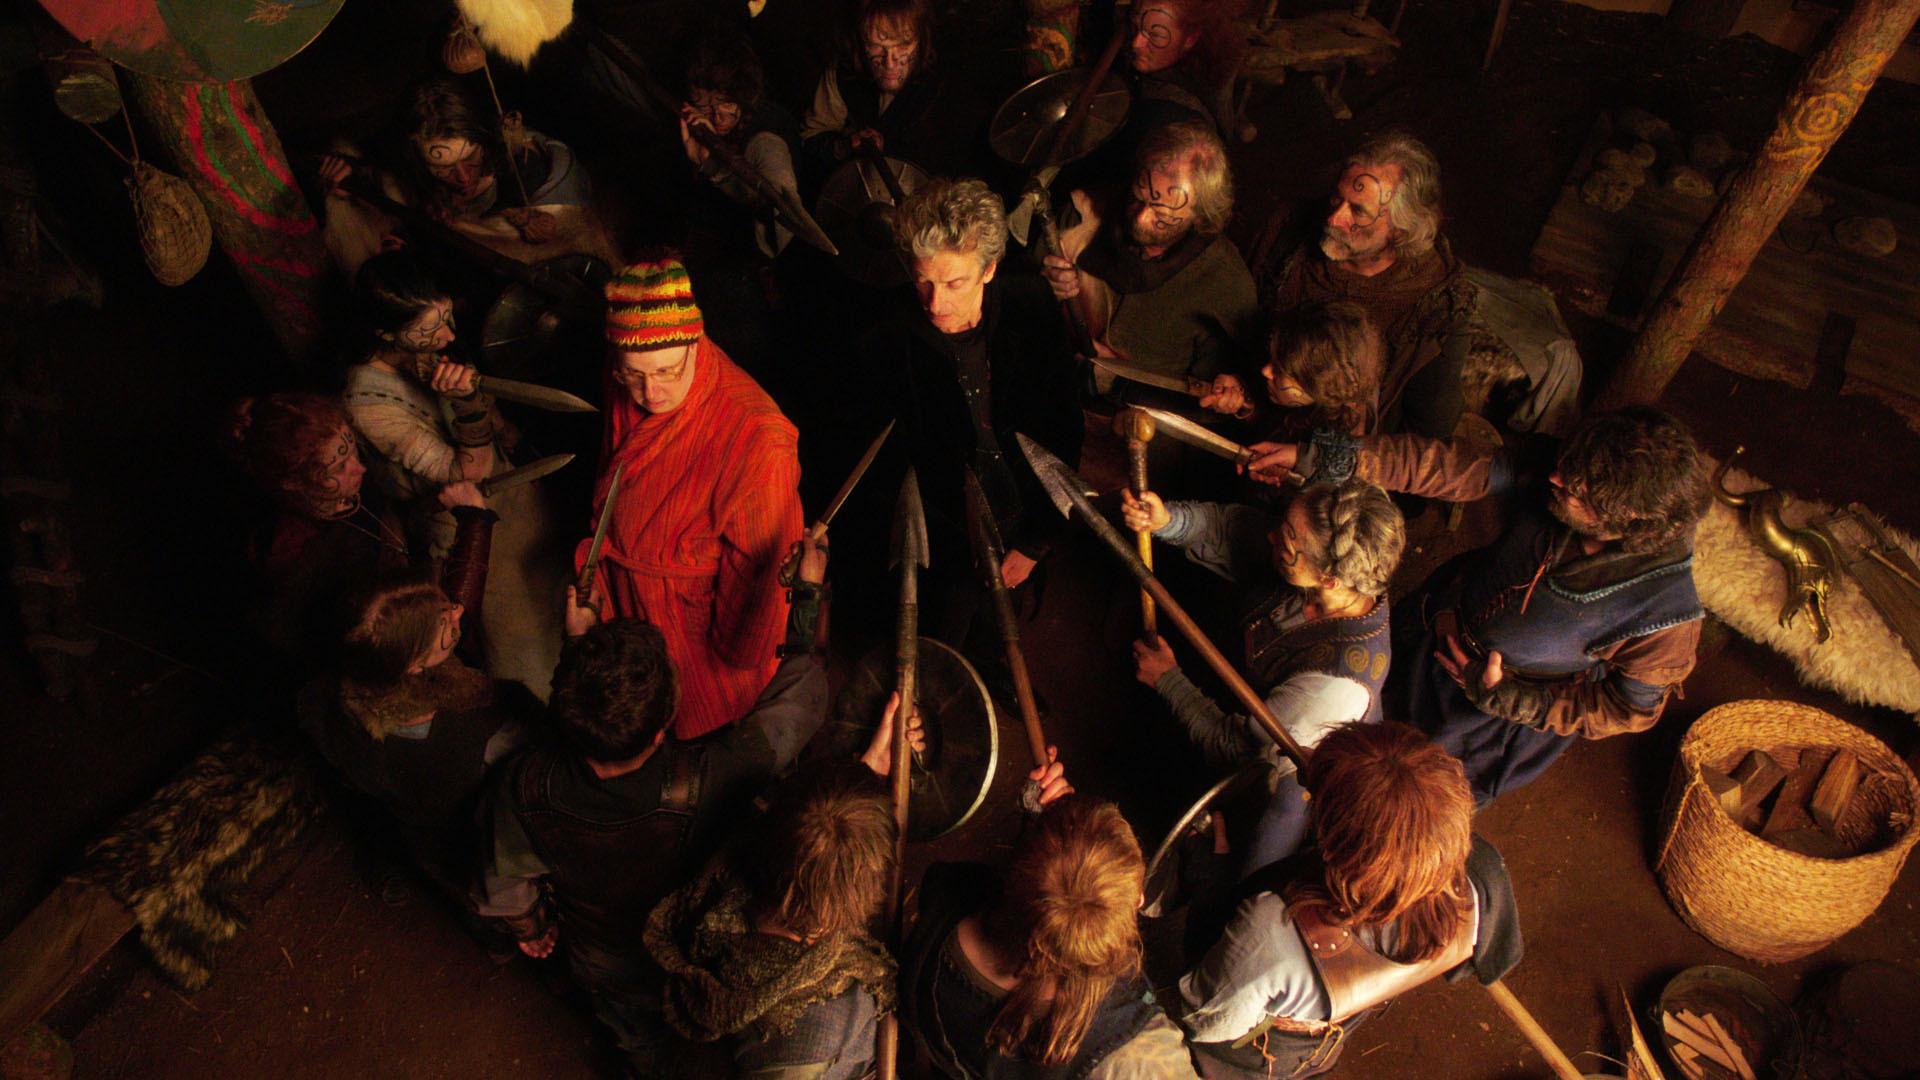 Nardole (Matt Lucas) and The Doctor  (Peter Capaldi) in episode 10, set in Aberdeenshire.